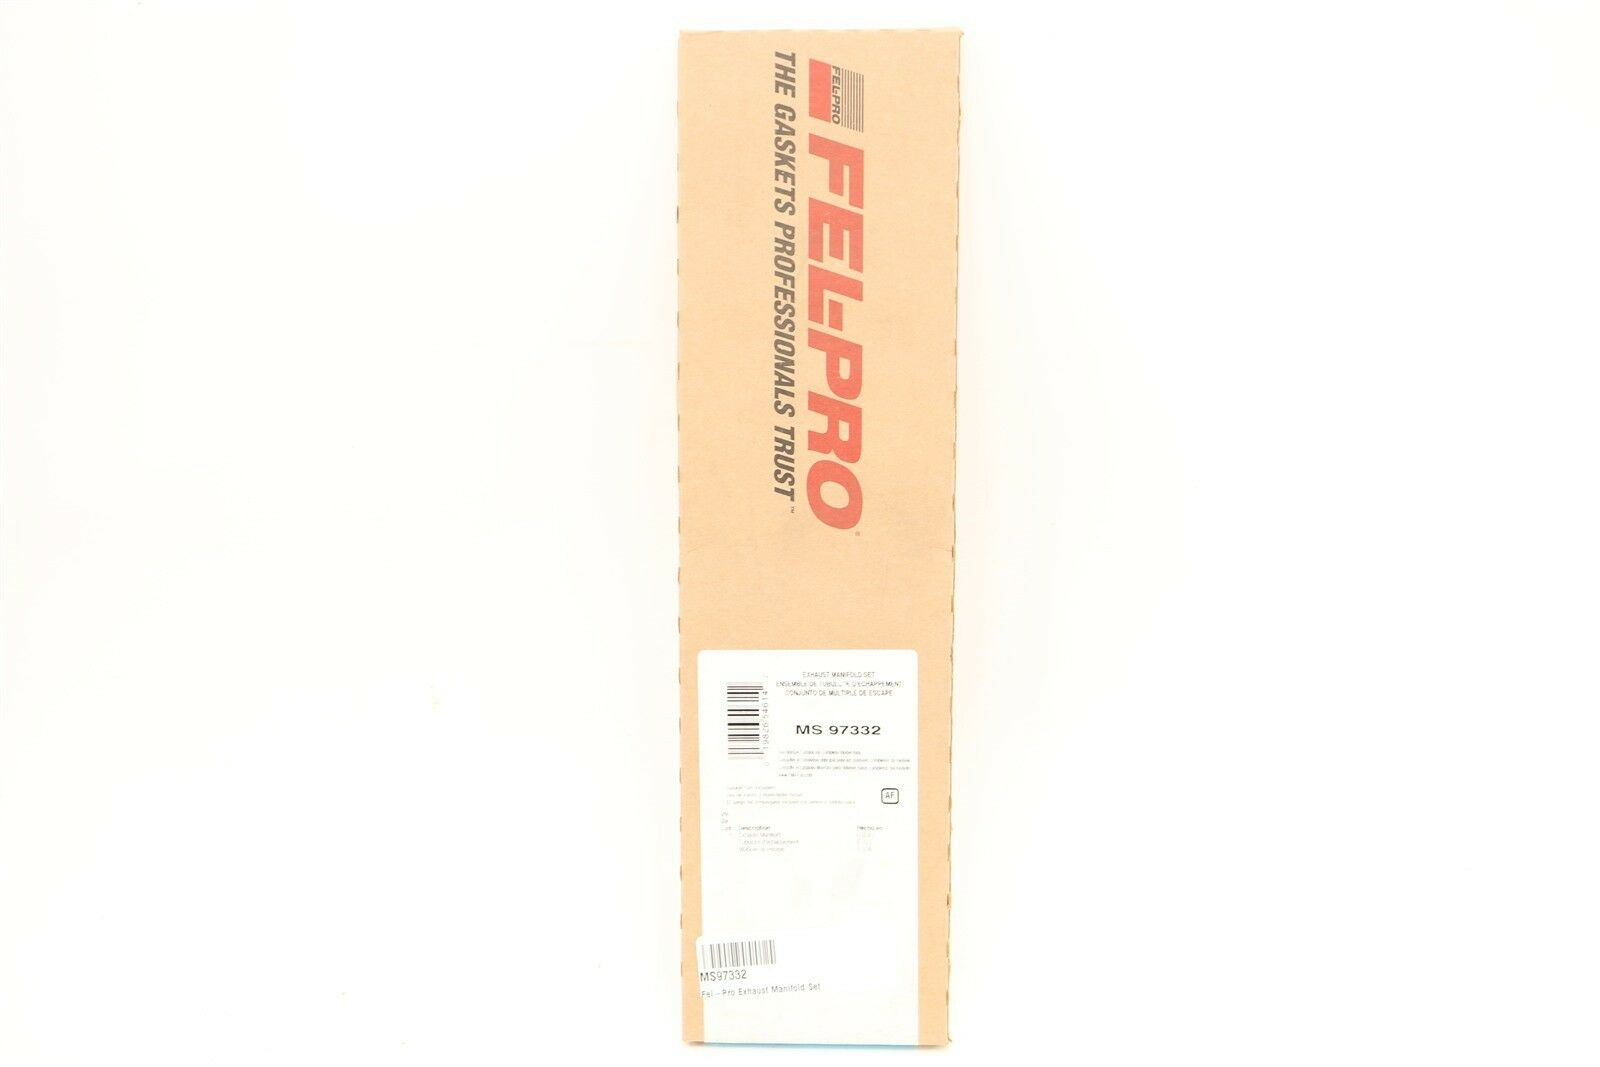 Exhaust Manifold Gasket Set Fel-Pro MS 97332